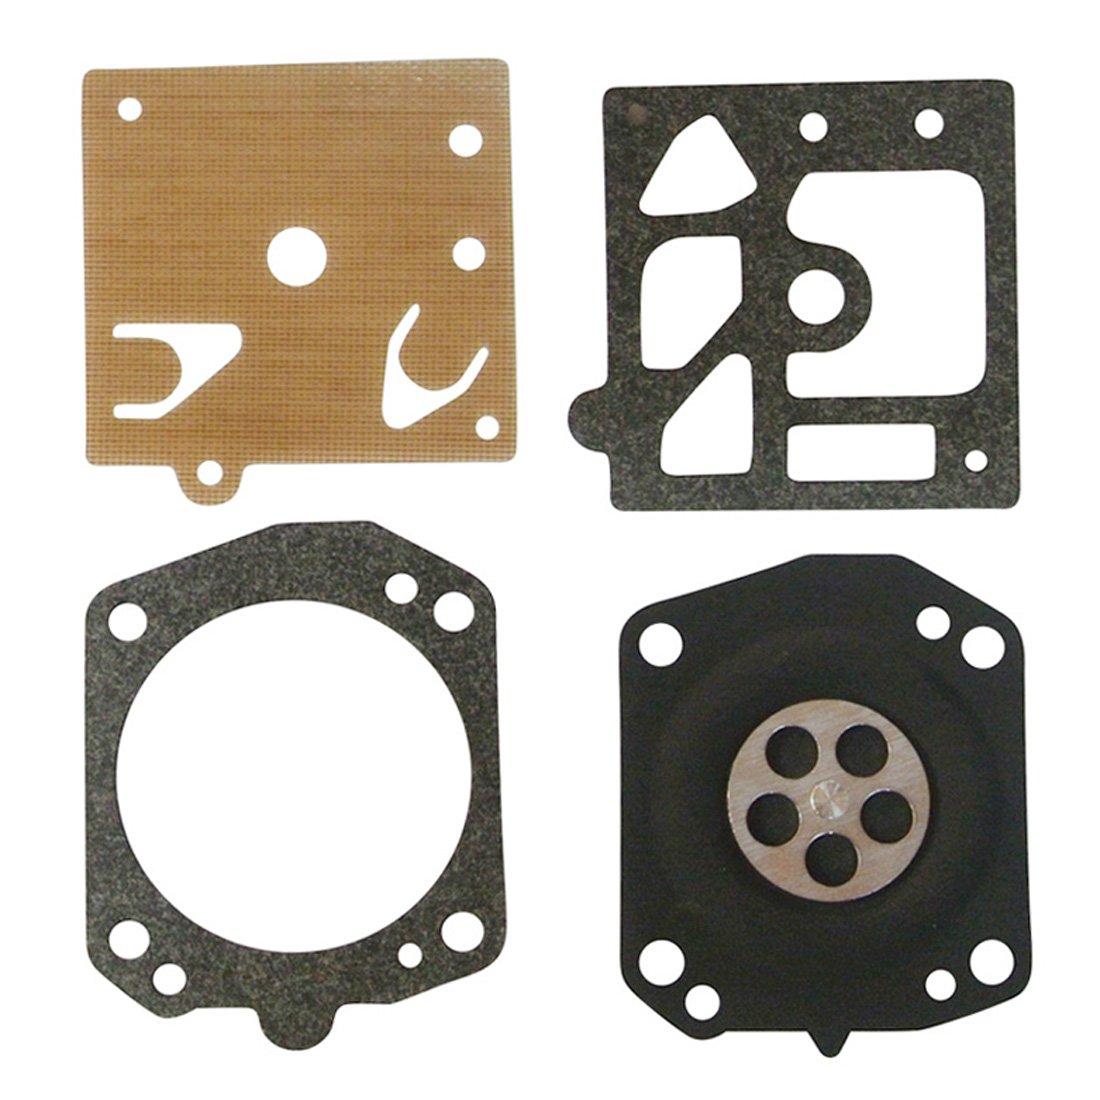 Ruichang Carburateur de Carb Rebuild Kit pour Stihl 027 029 039 MS310 MS390 Walbro℉ K10-HD Carb